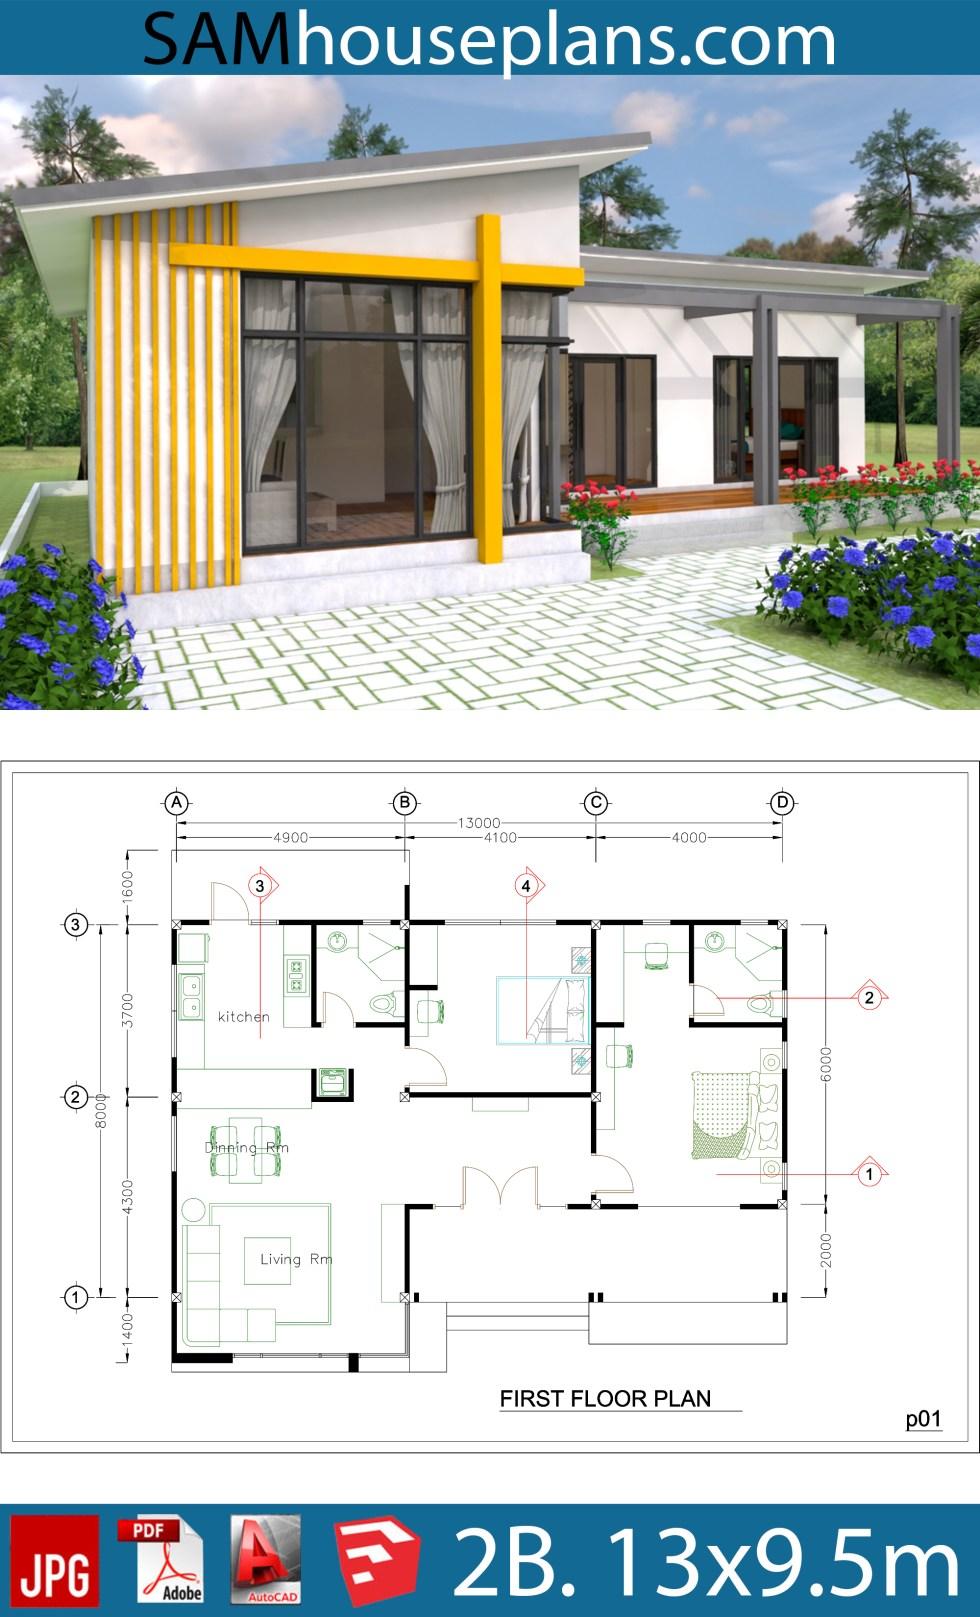 House Plans 13x9.5m Full Plan 2Beds - SamHousePlans